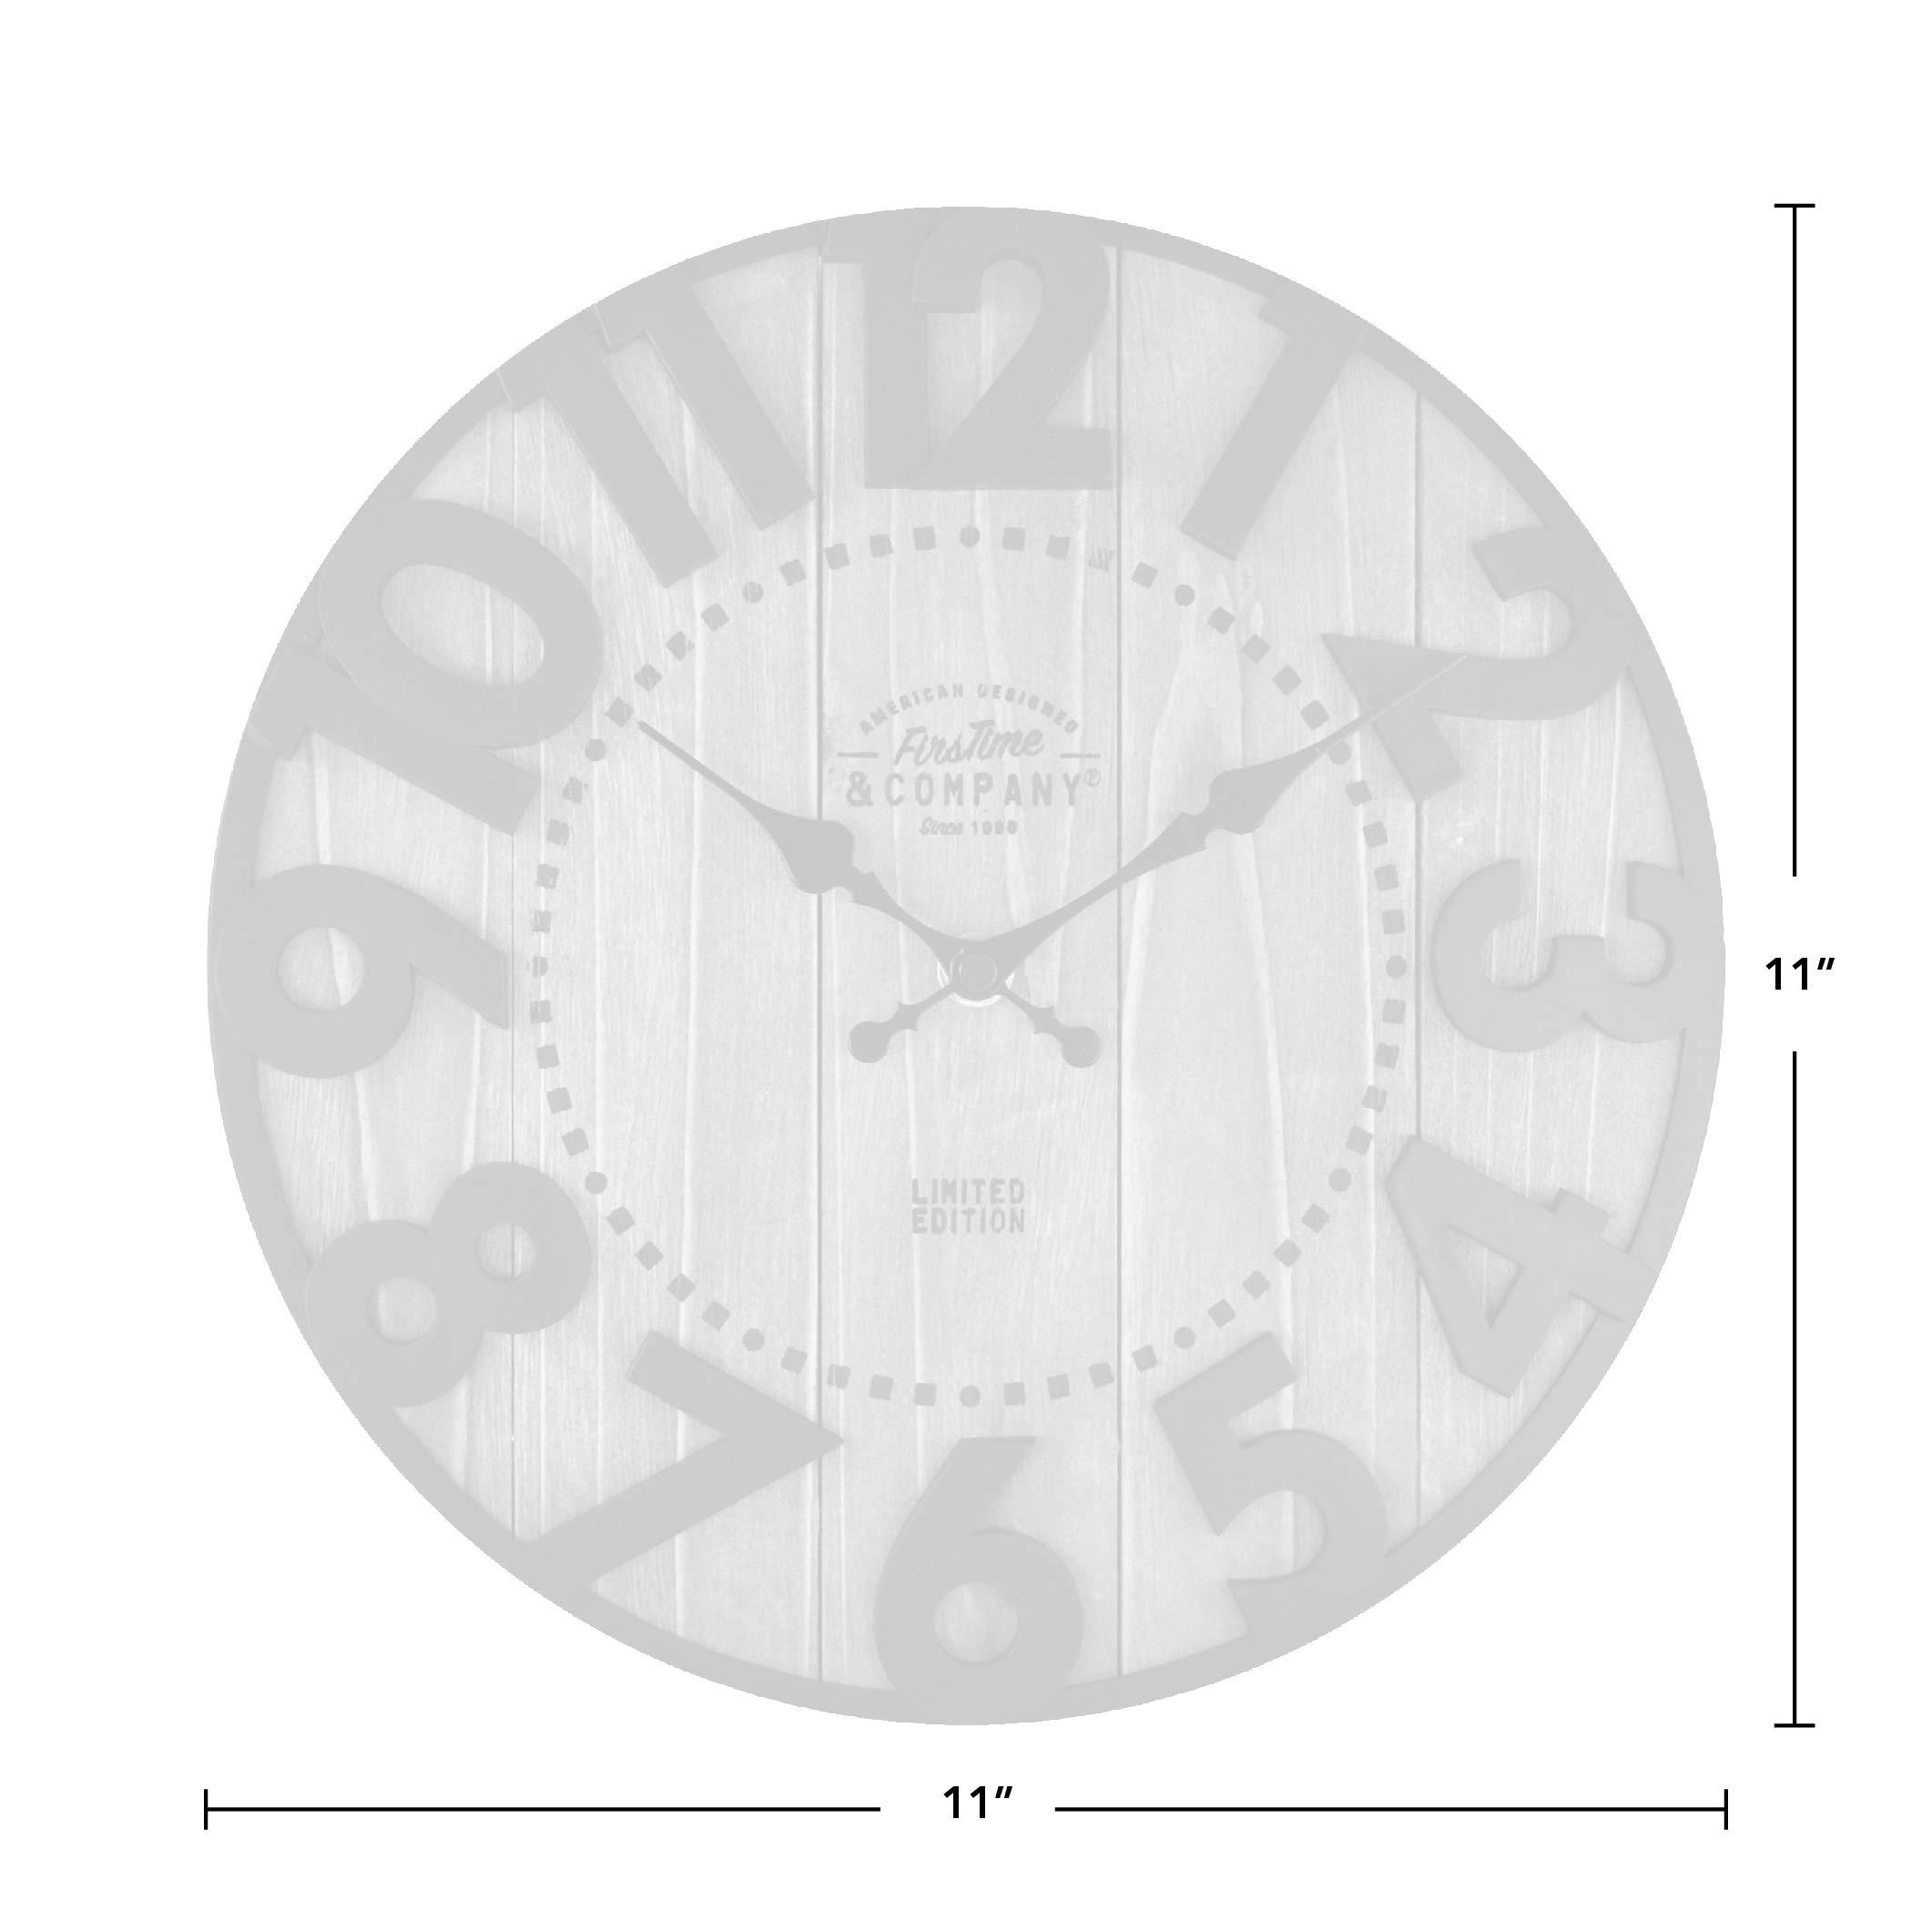 Firstime Co 00254 Langton Wall Clock 11 Antique Brown Black Wall Clocks Amazon Com Au